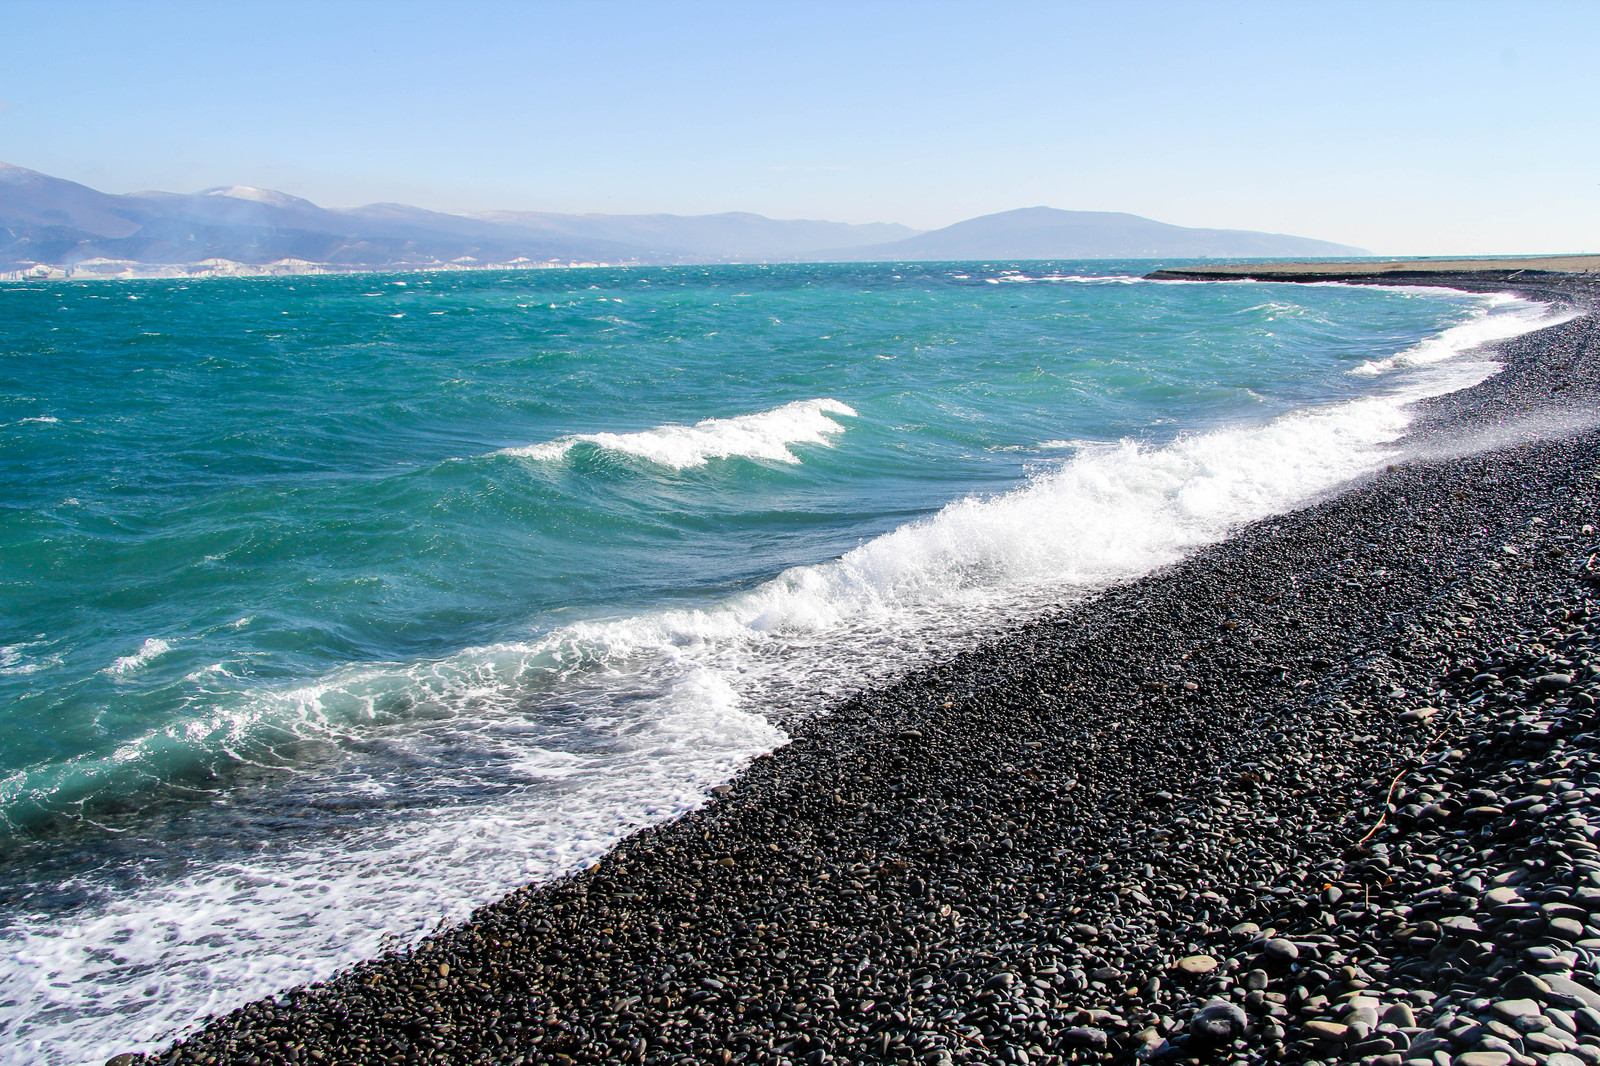 фото море пляж черное море